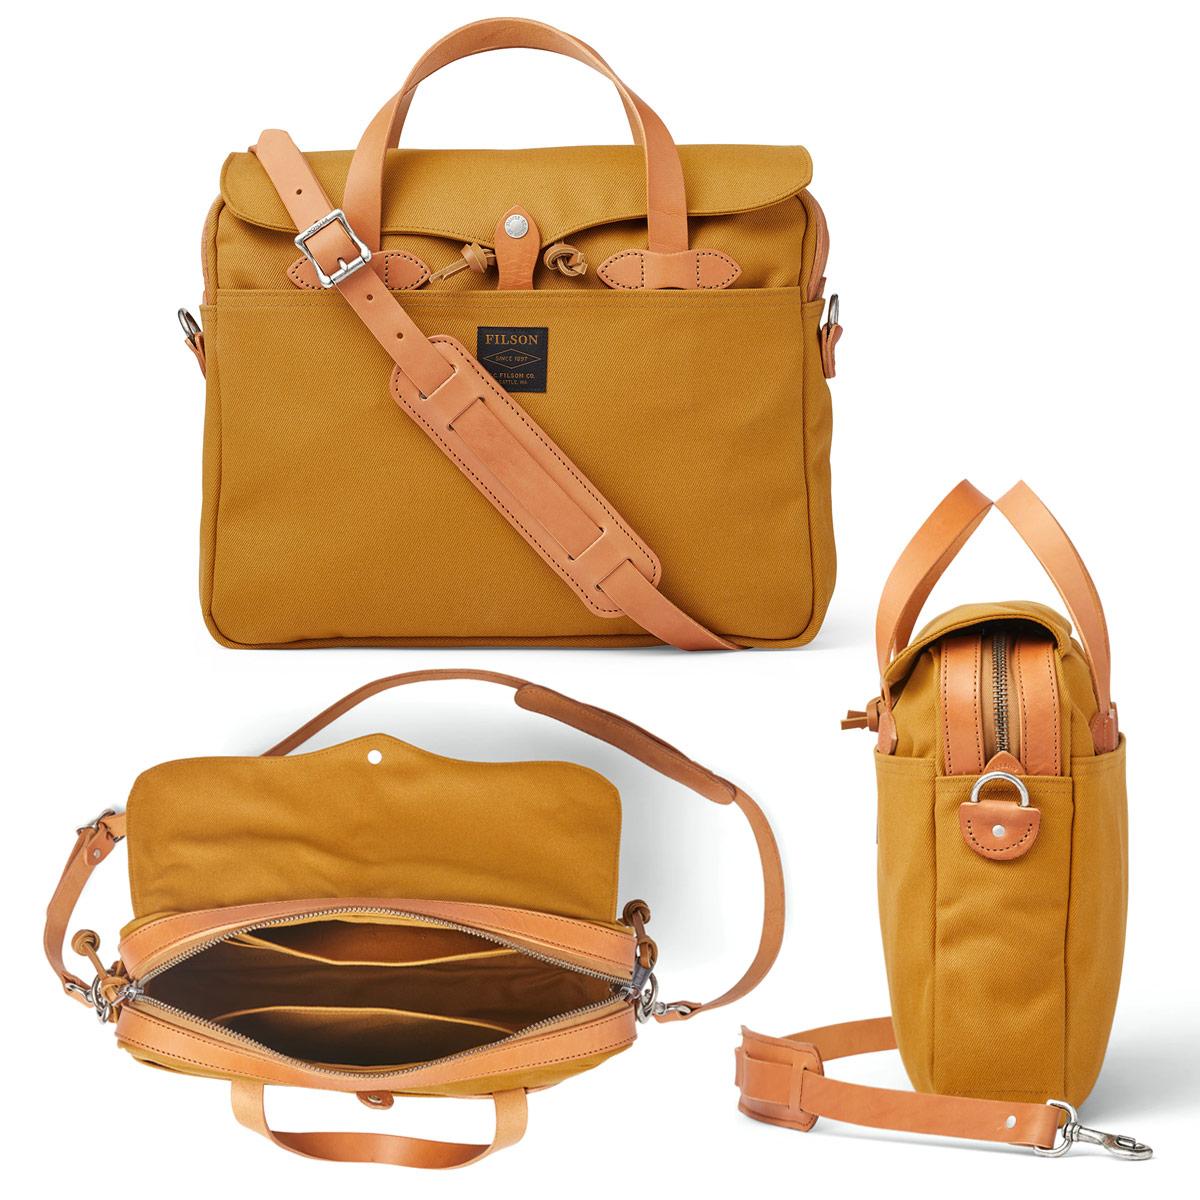 Filson Original Briefcase Chessie Tan, extraordinary bag for an ordinary day